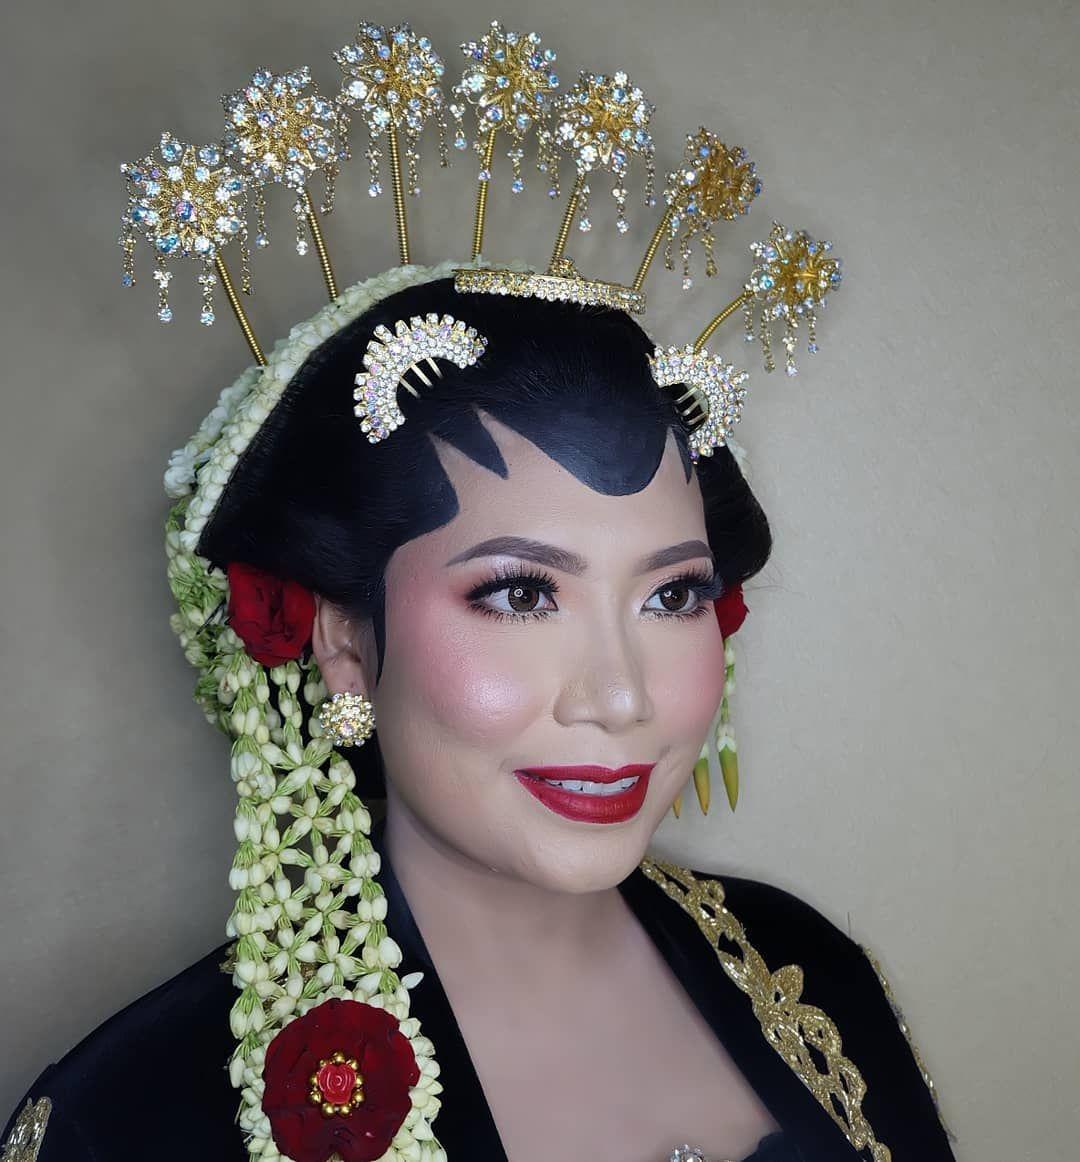 Ready For Resepsi Super Super Latepost Adat Solo Putri Flawless Makeup By Me Sandrazulfakar Wedding Service Talitha Id Hair Do Paes Imma Hai Resepsi